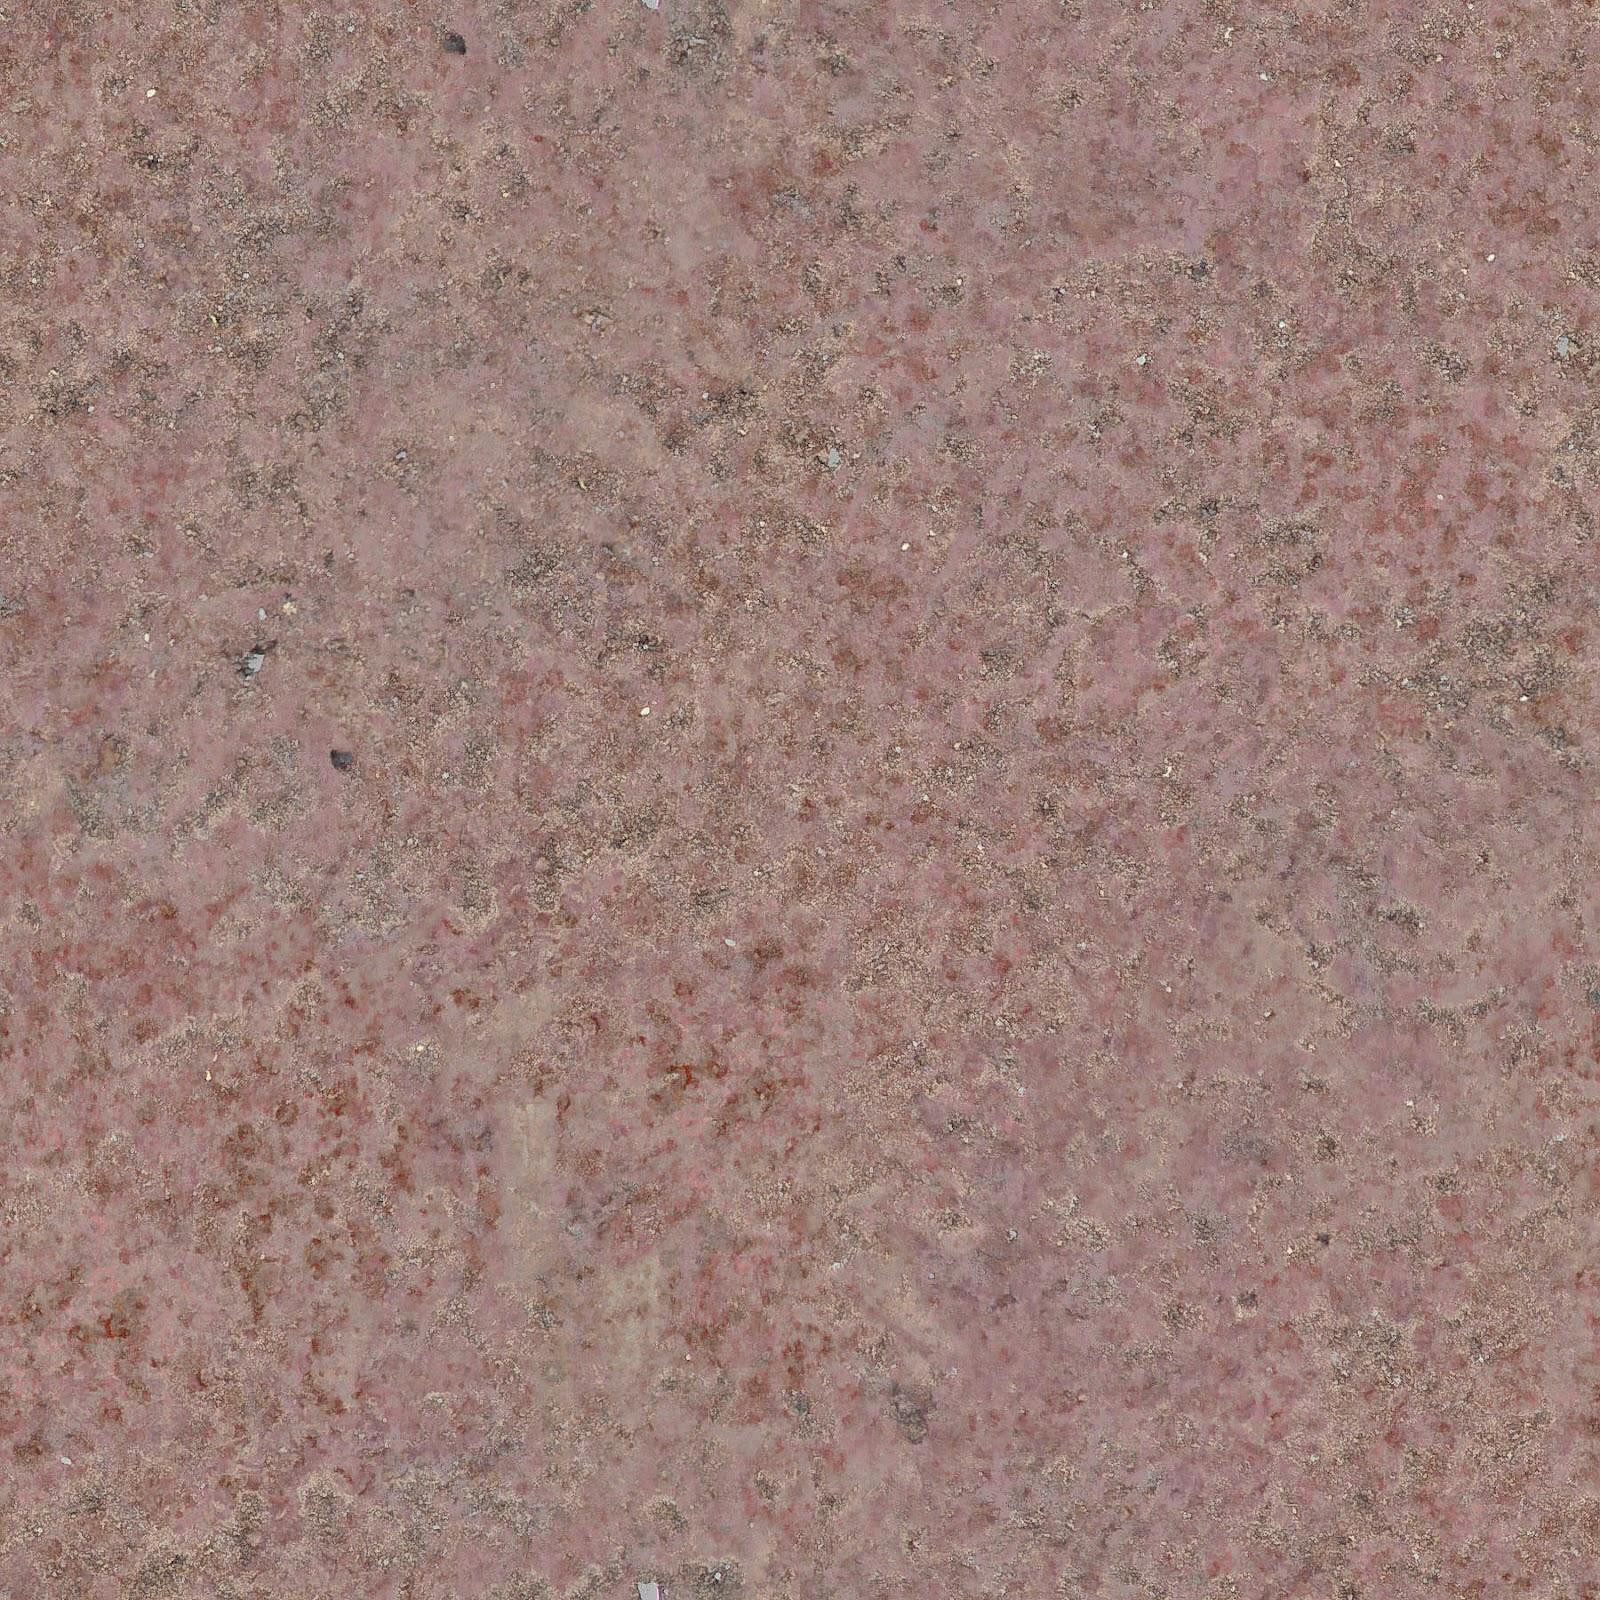 Tileable Metal Texture  10. High Resolution Seamless Textures  Tileable Metal Texture  10